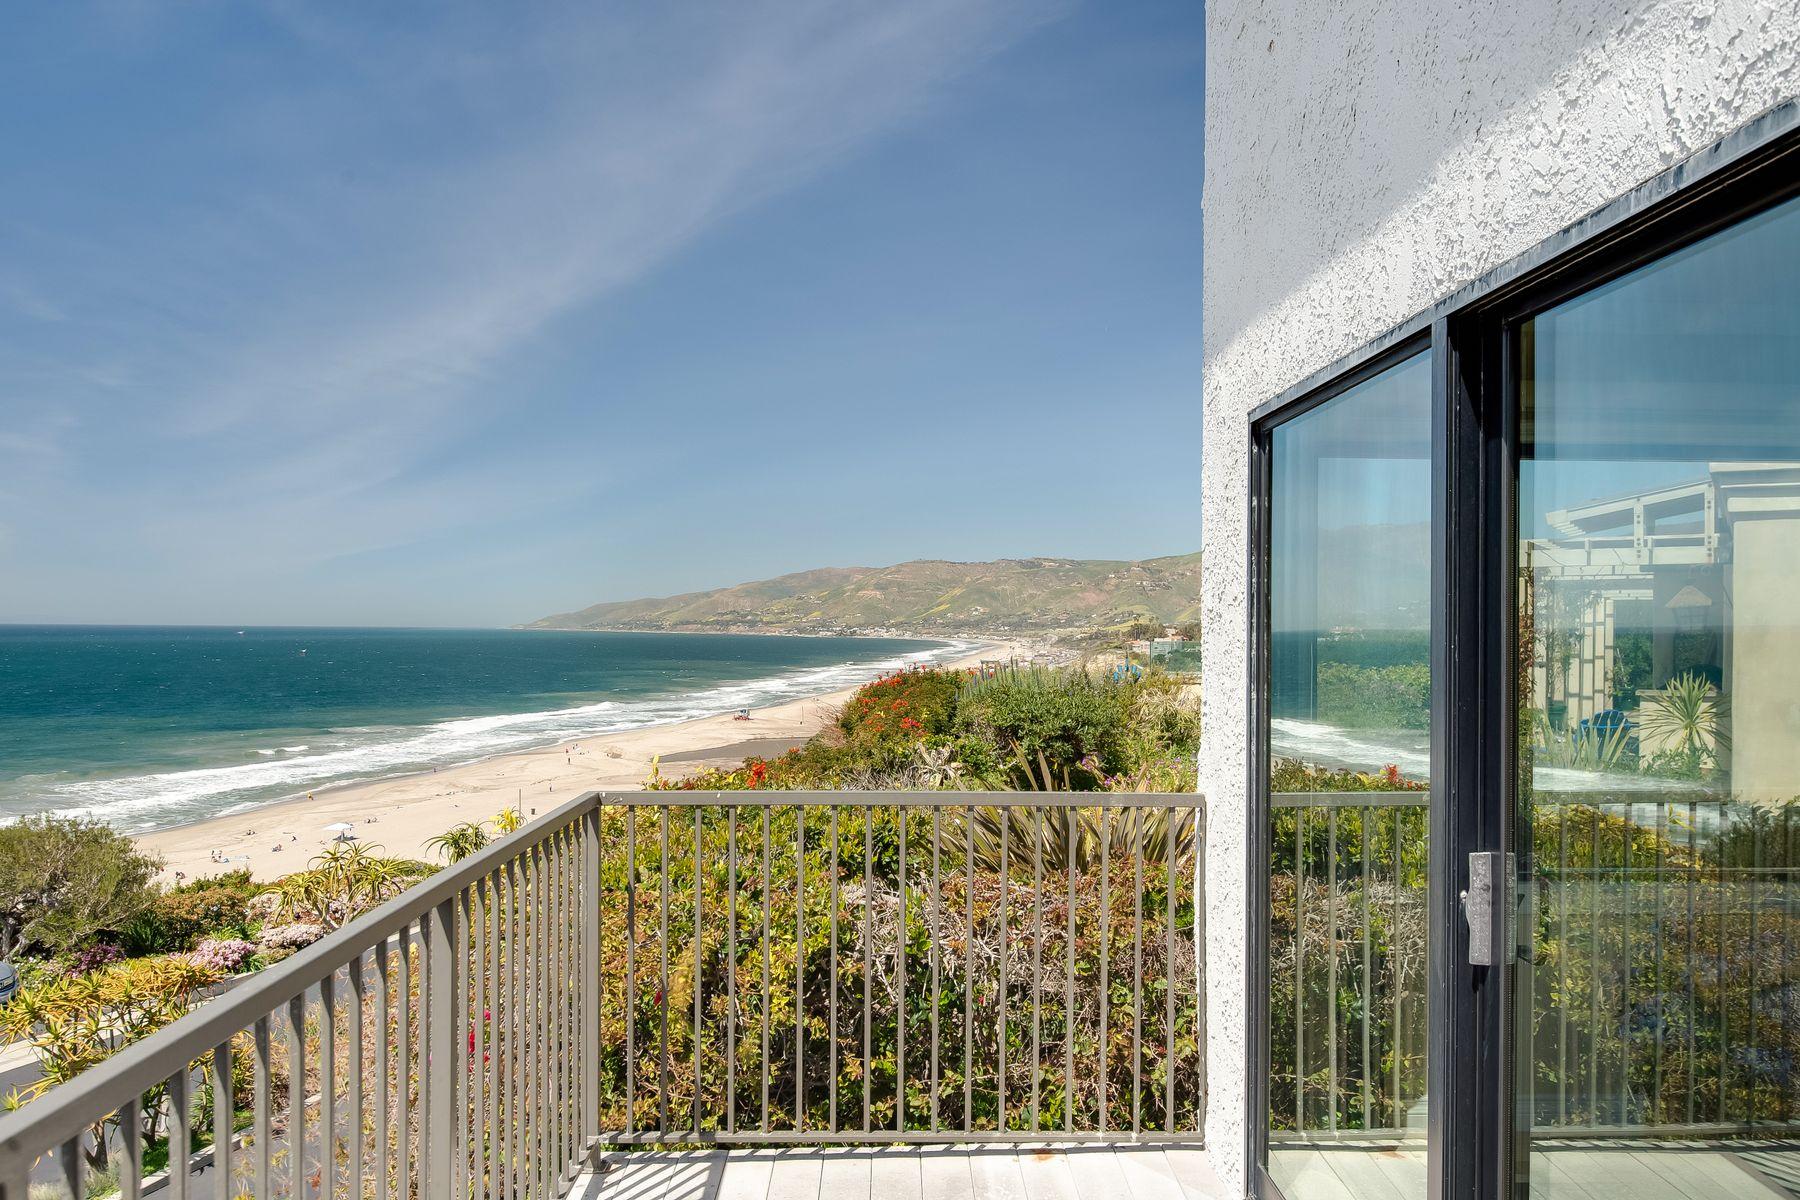 townhouses for Active at Malibu - Spectacular Beach & Coastline 29717 Zuma Bay Way Malibu, California 90265 United States